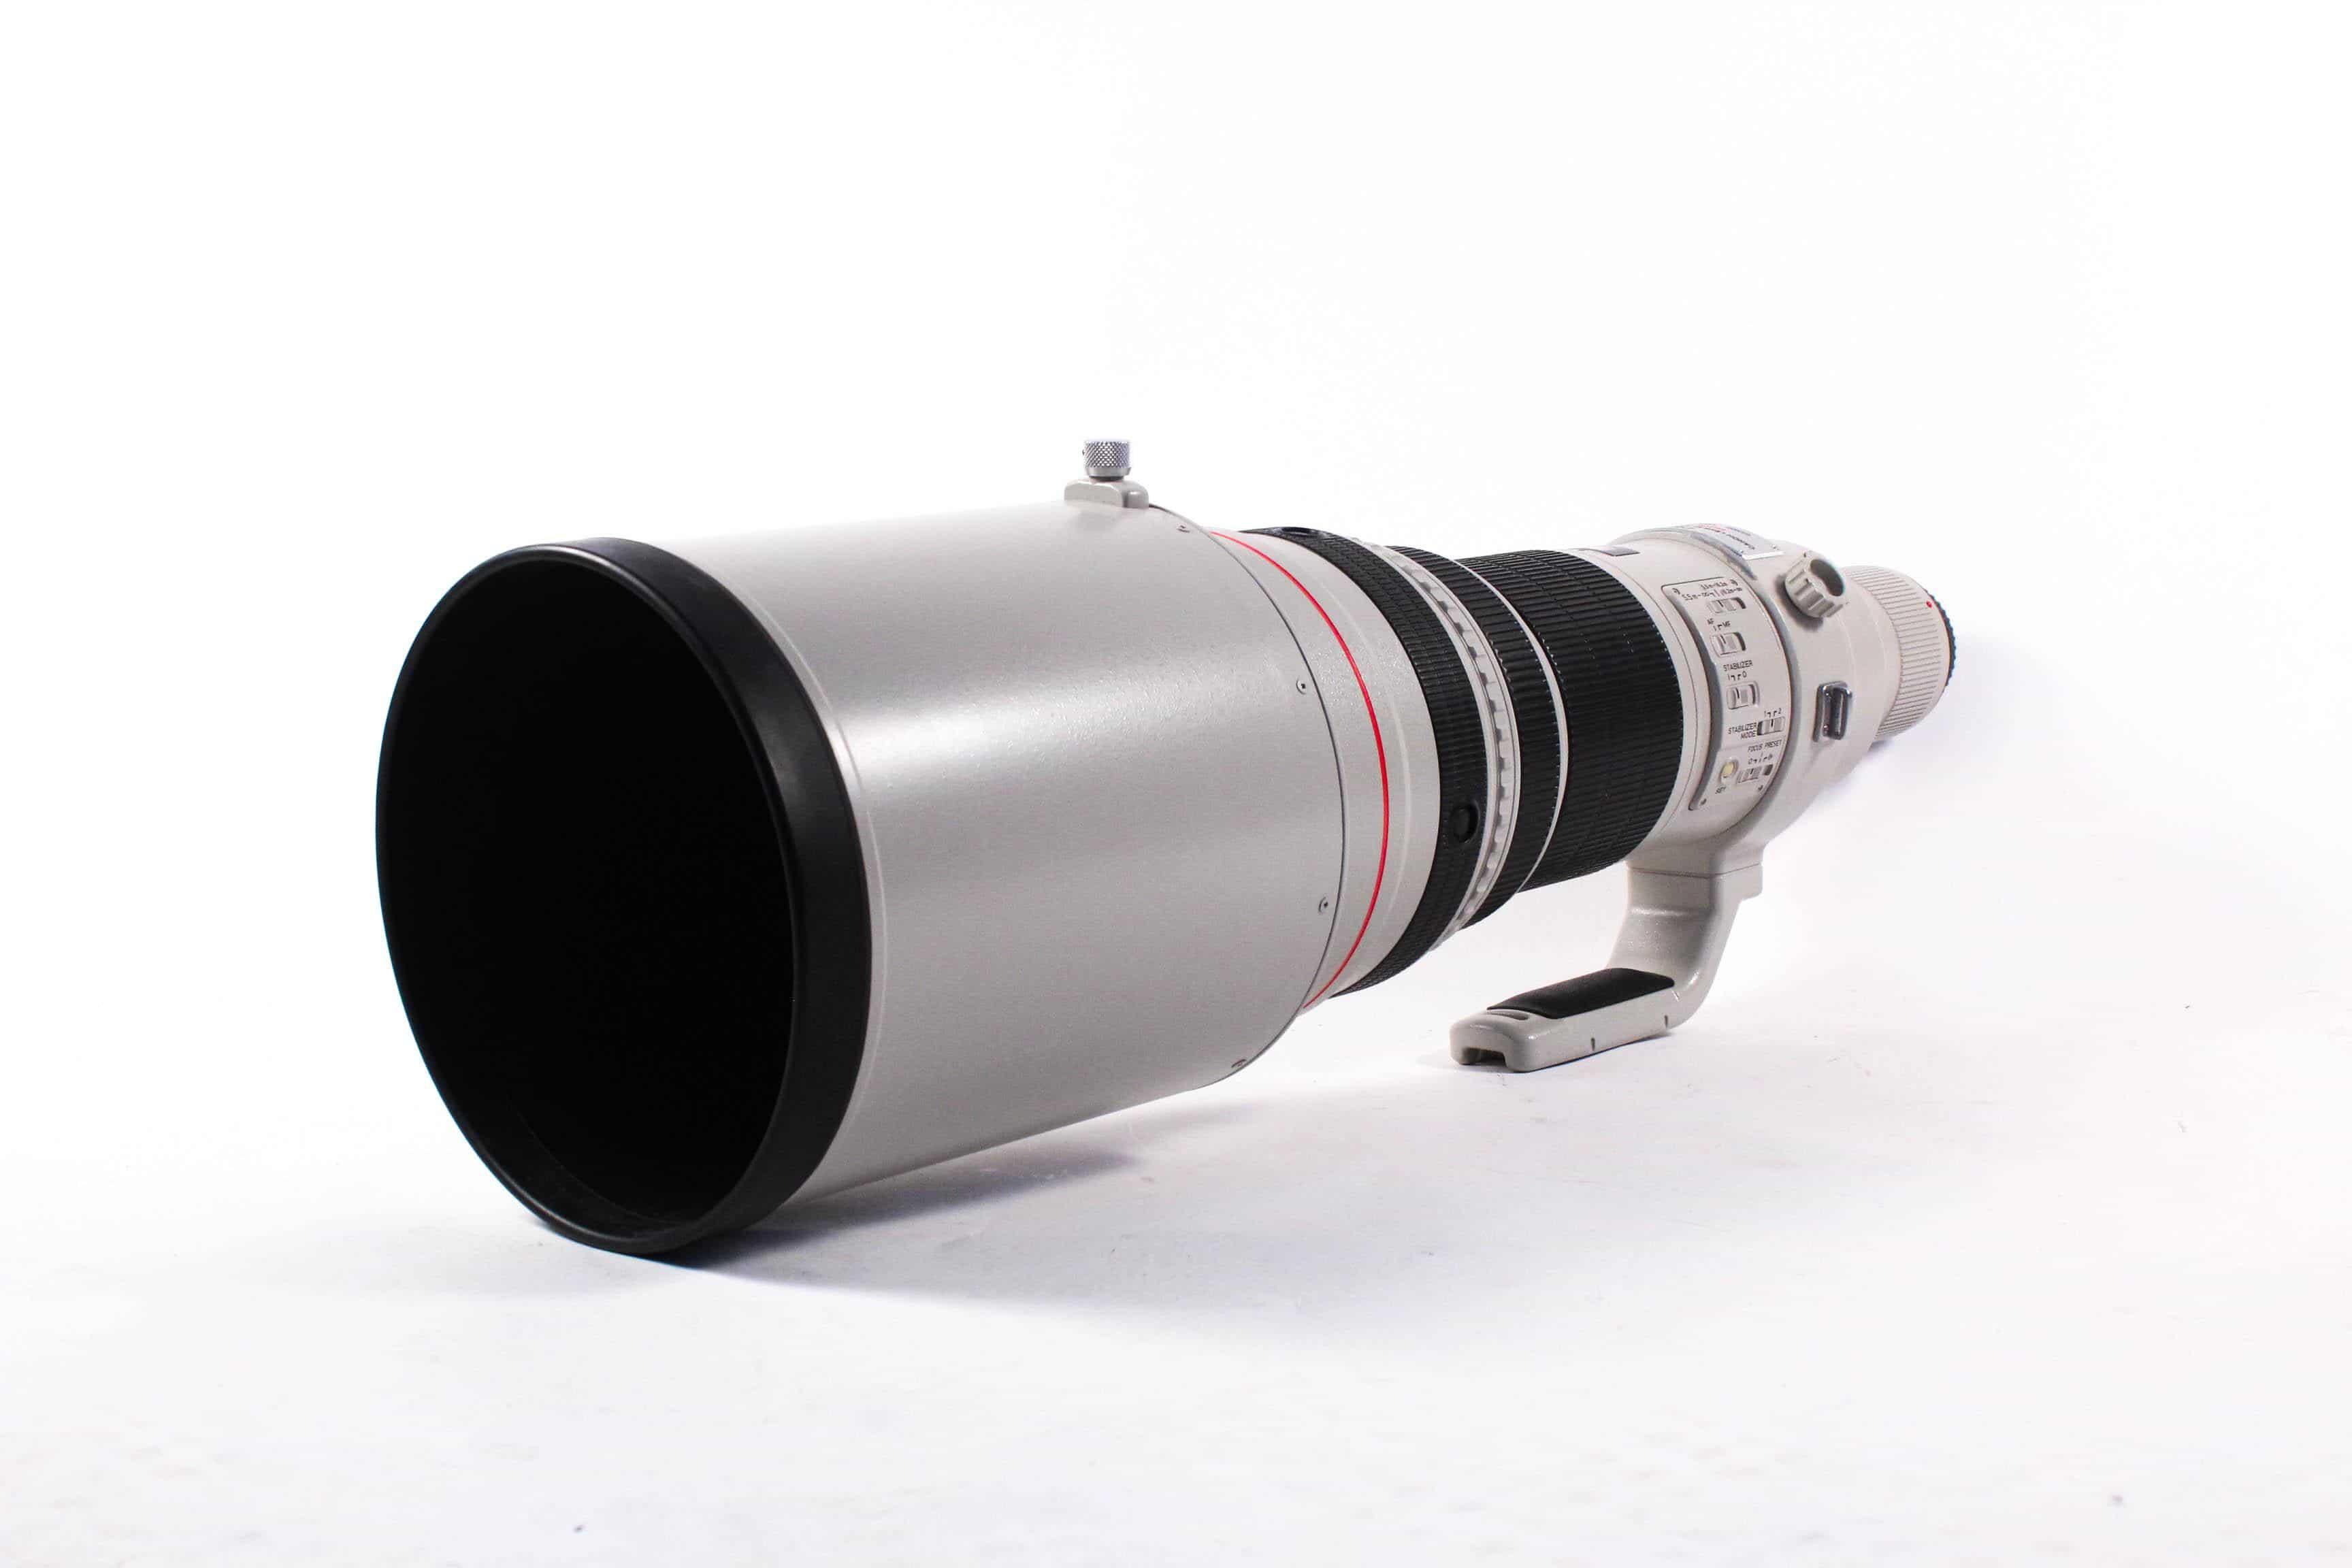 600mmf4 min image